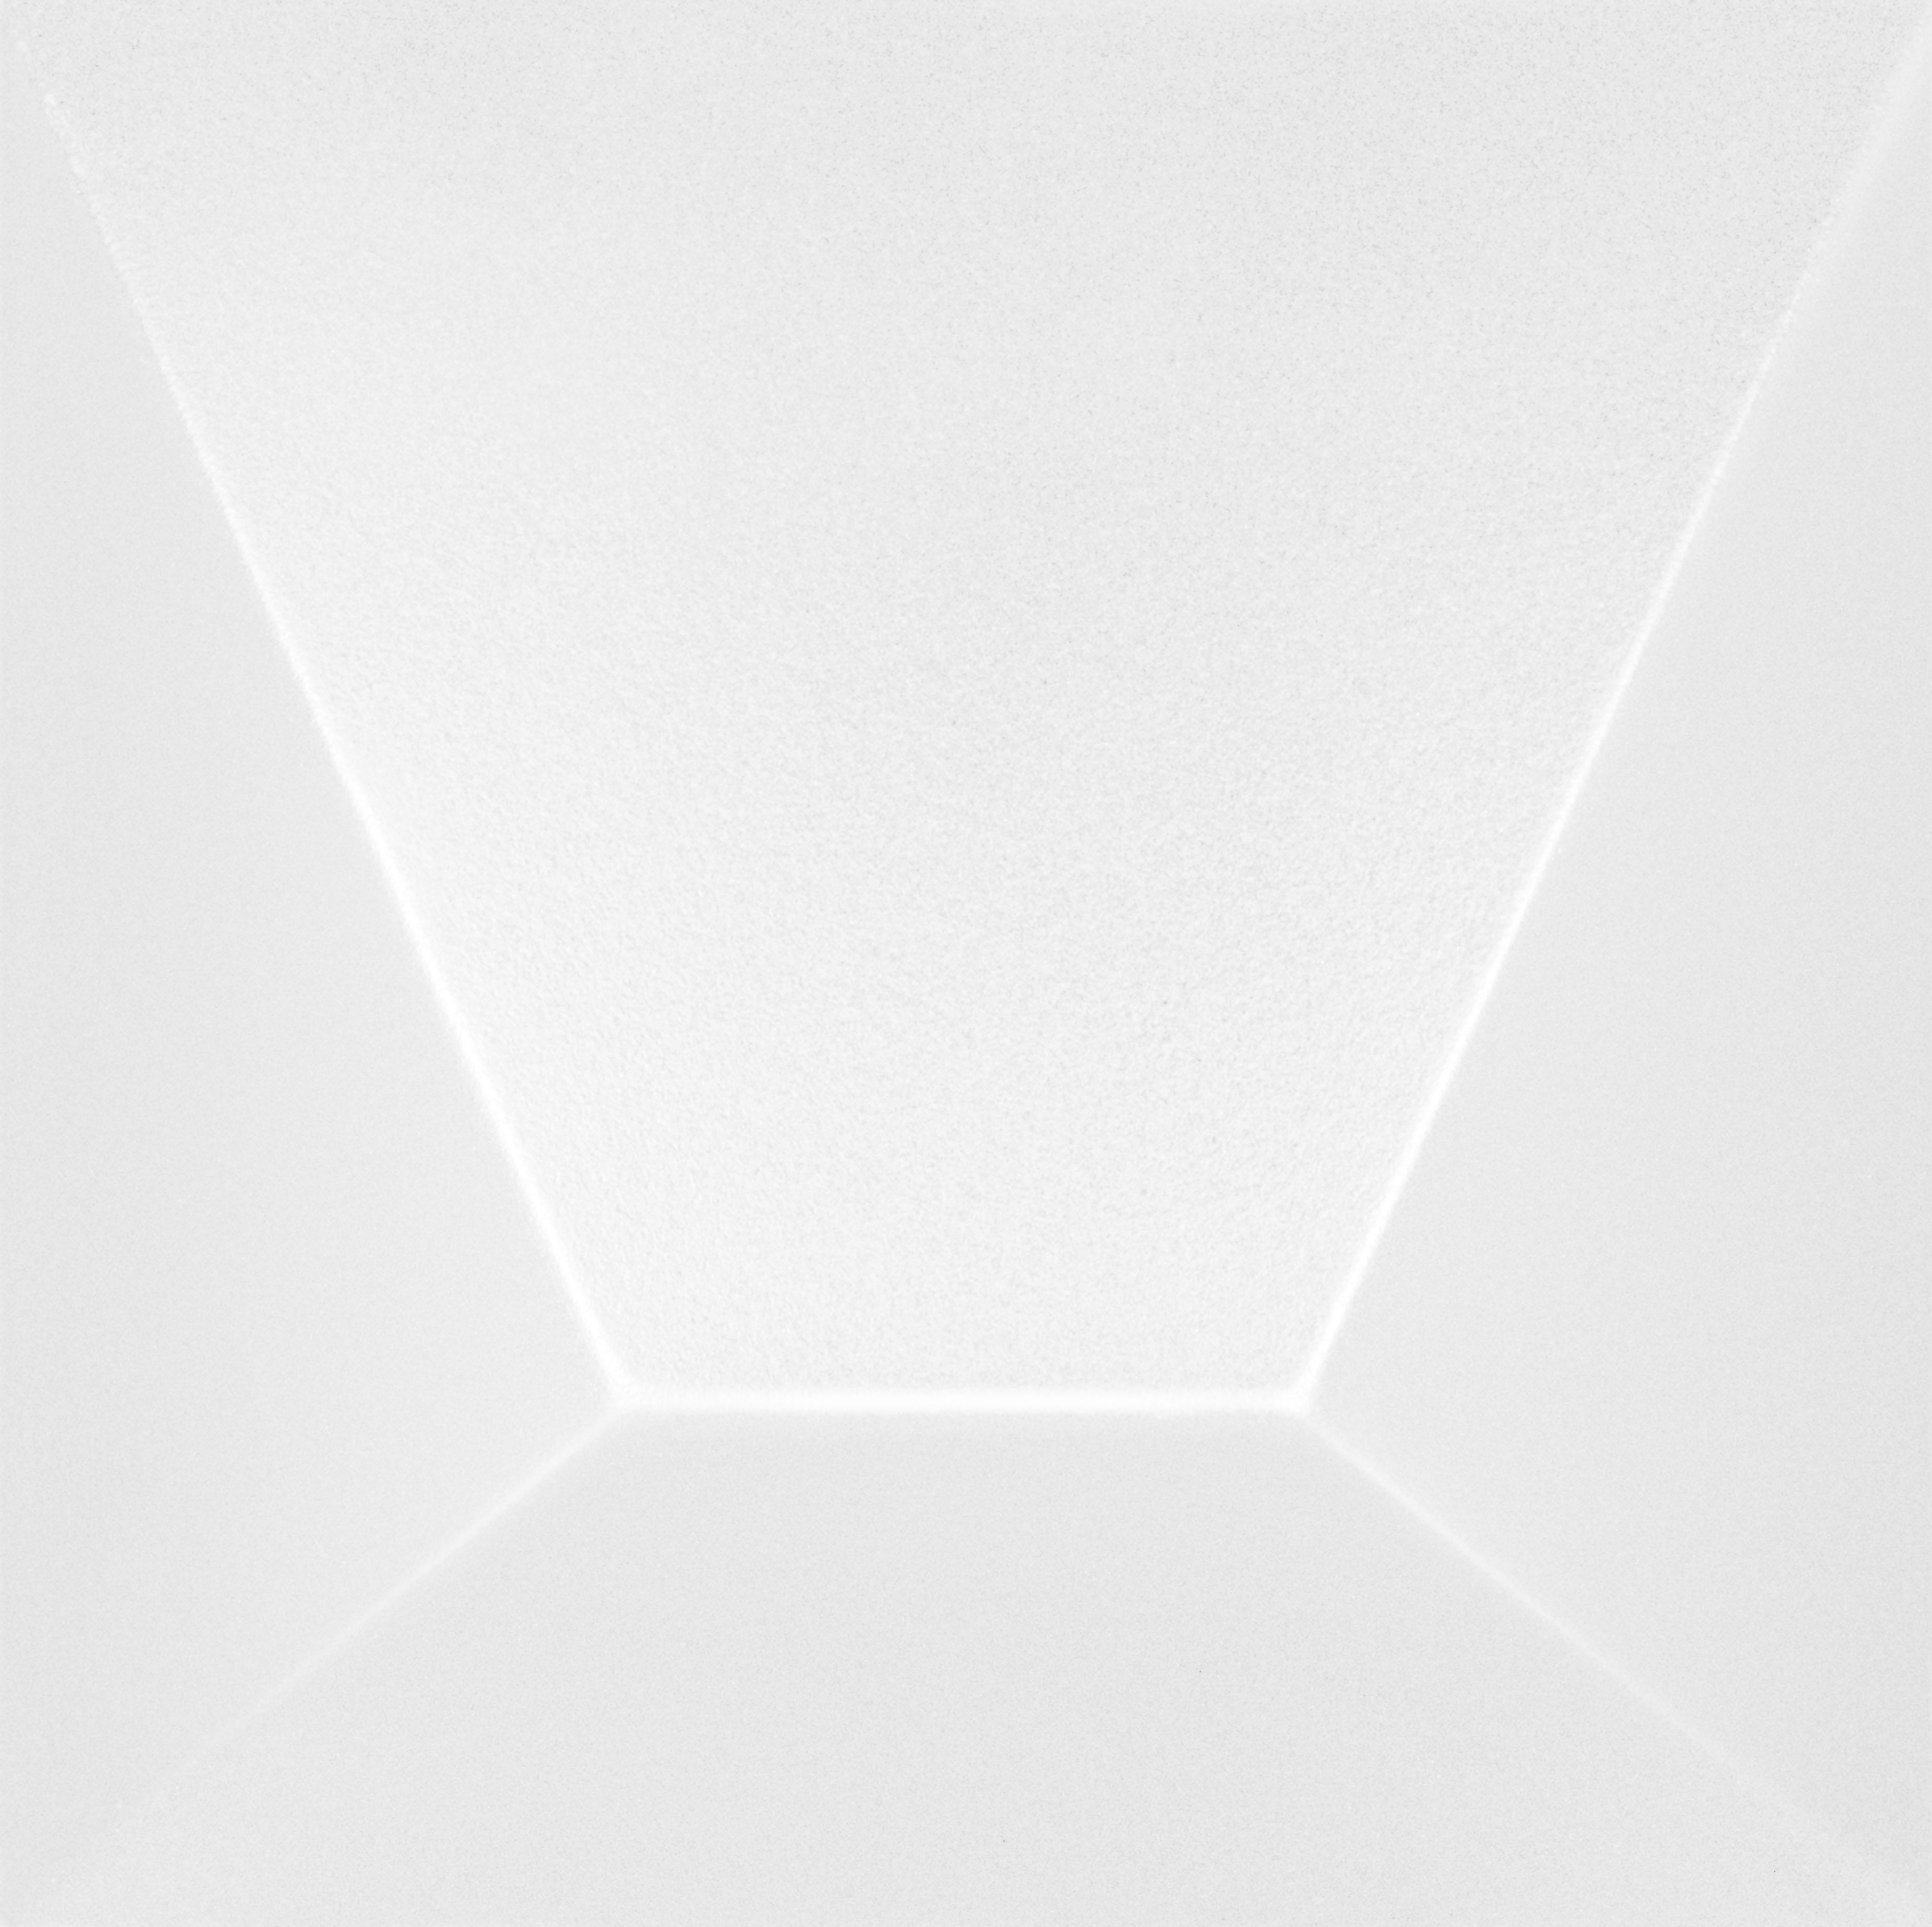 RV BLOCK WHITE MT 15.4X15.4